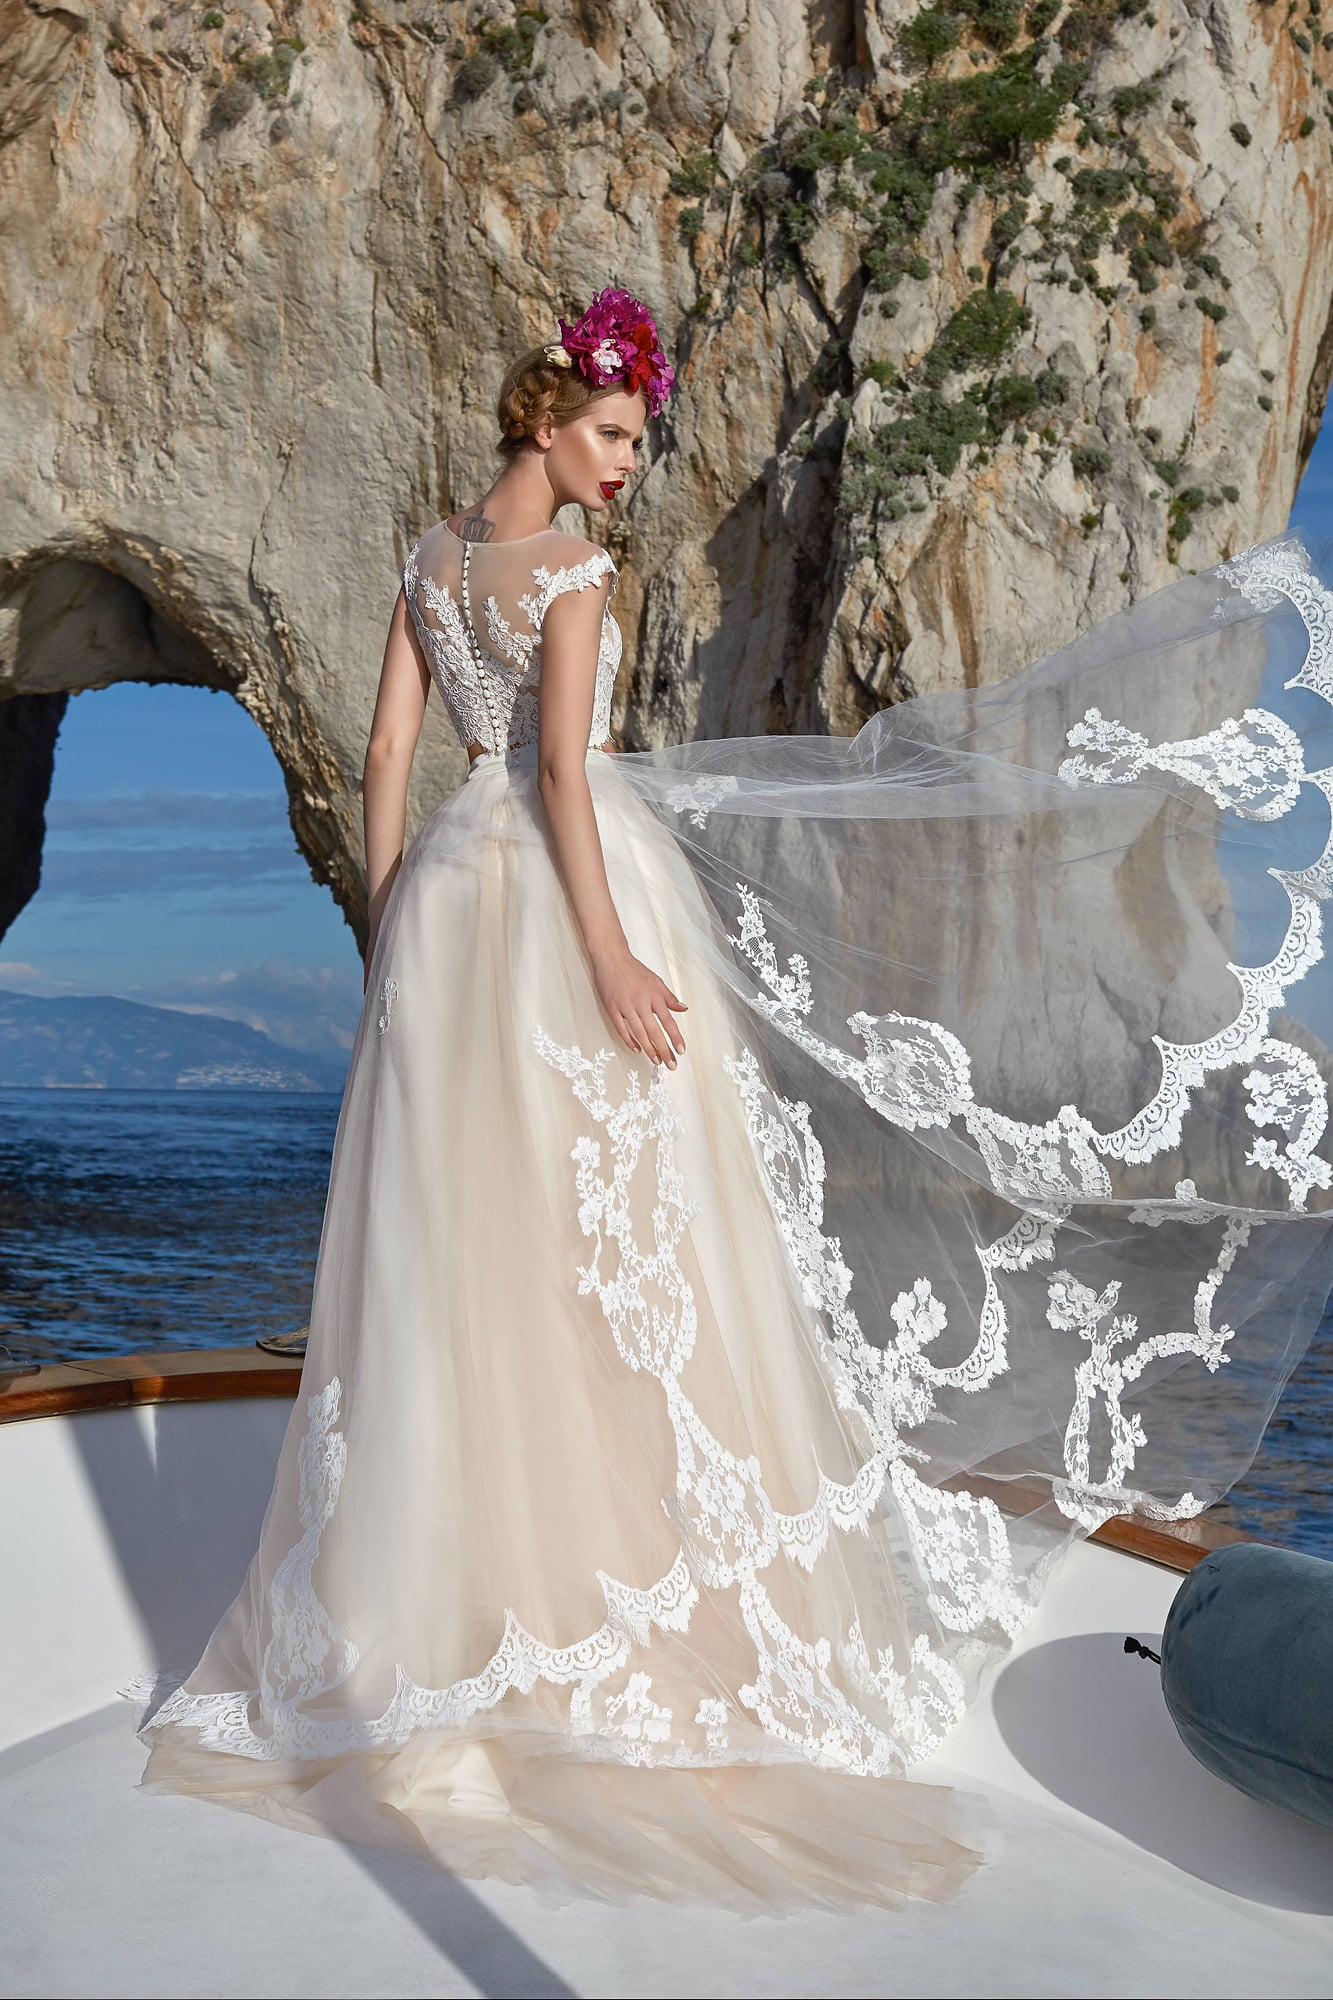 Свадебное платье айвори с испанским кружевом